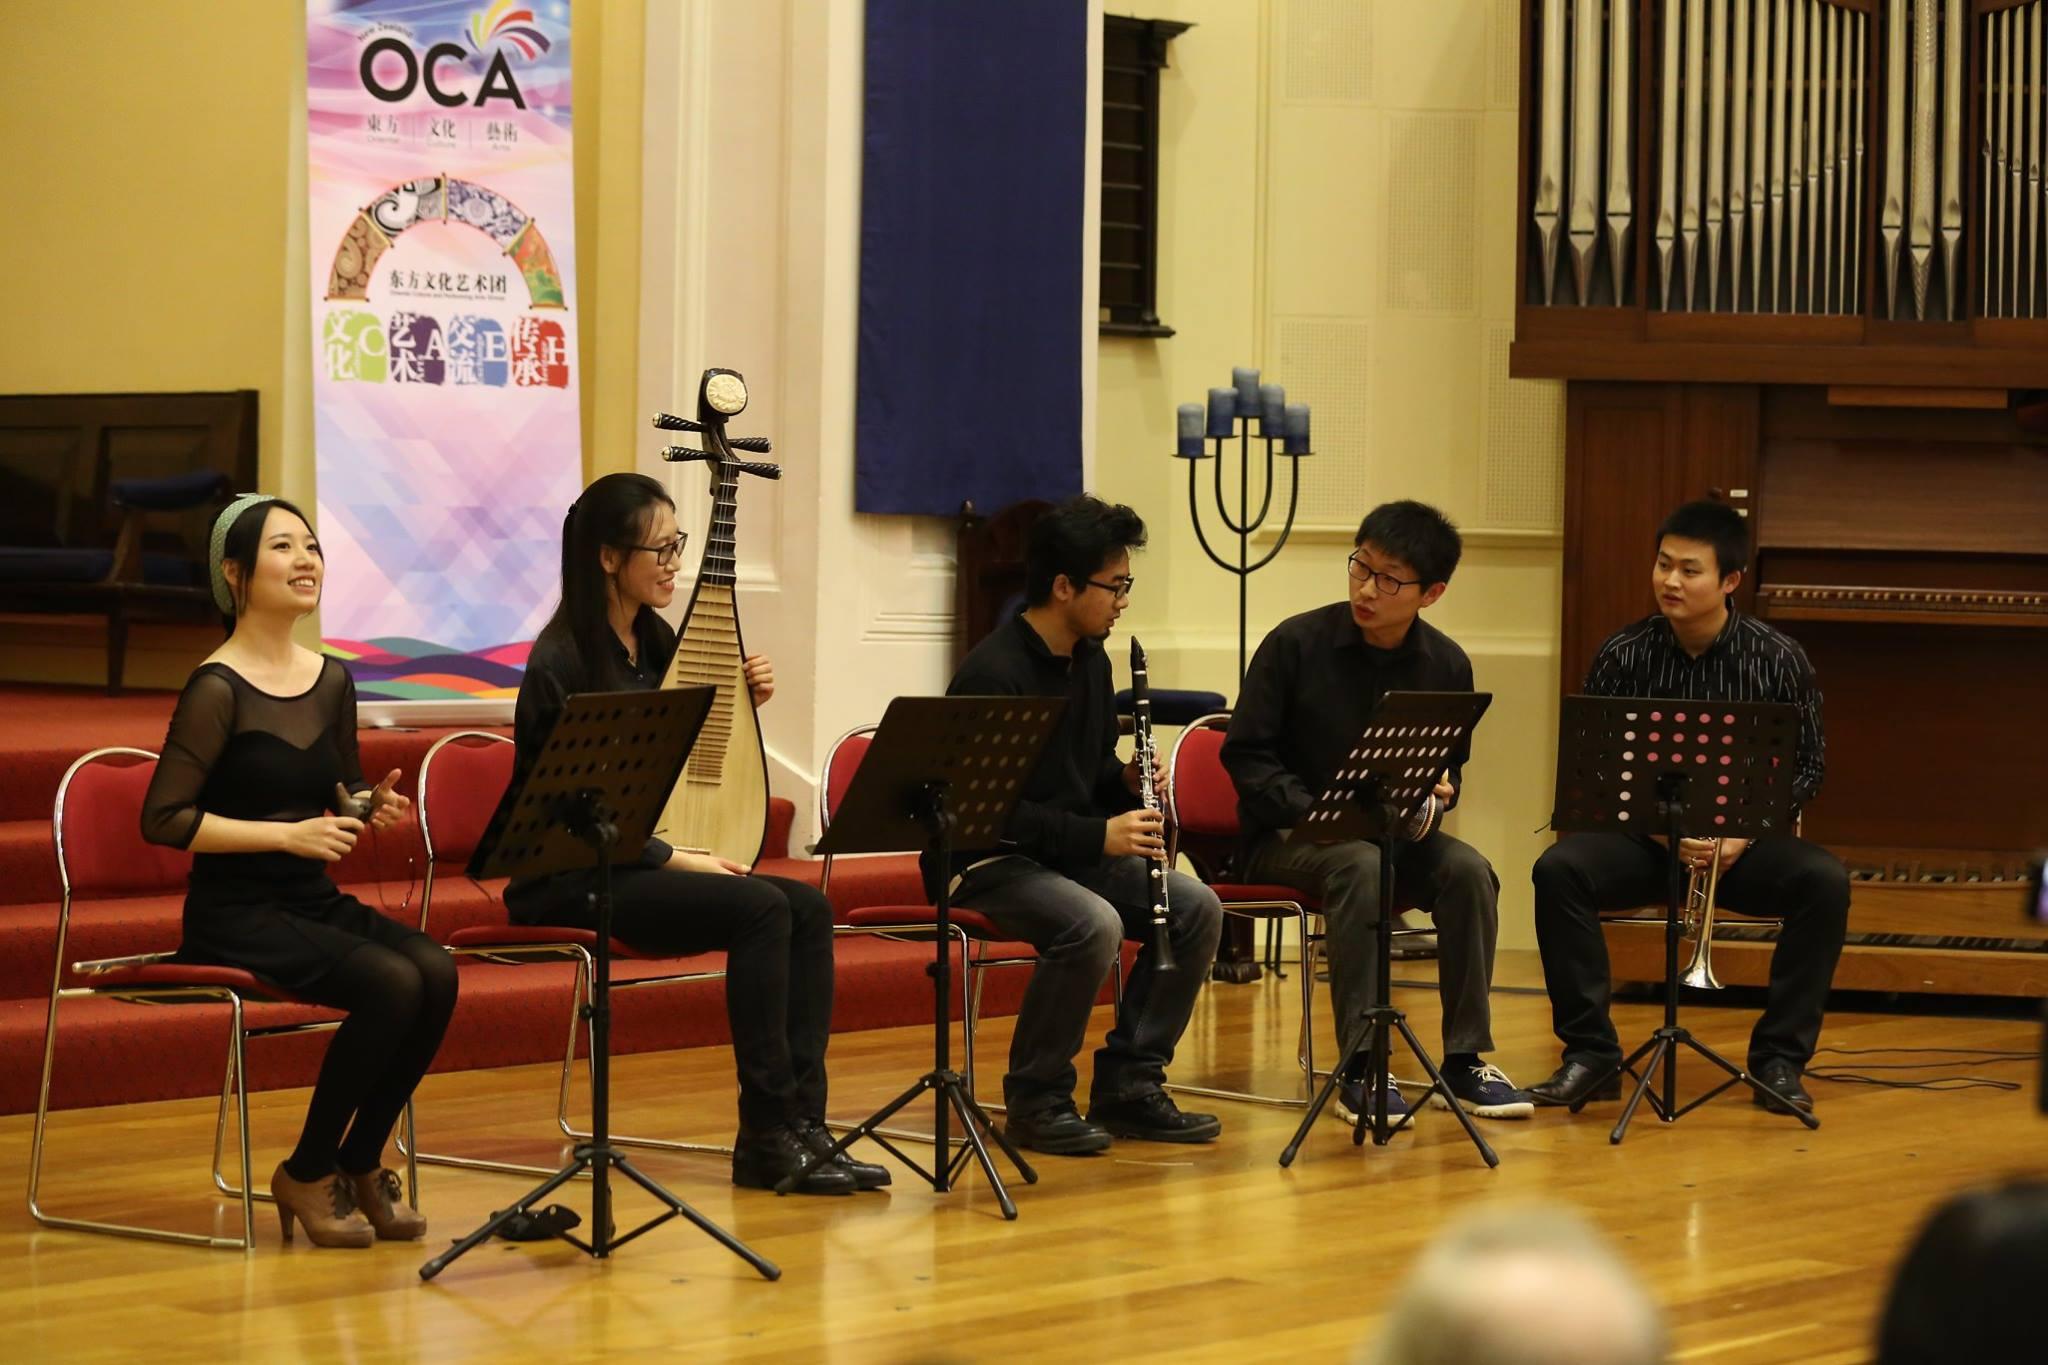 PRC National Day Celebration Concert